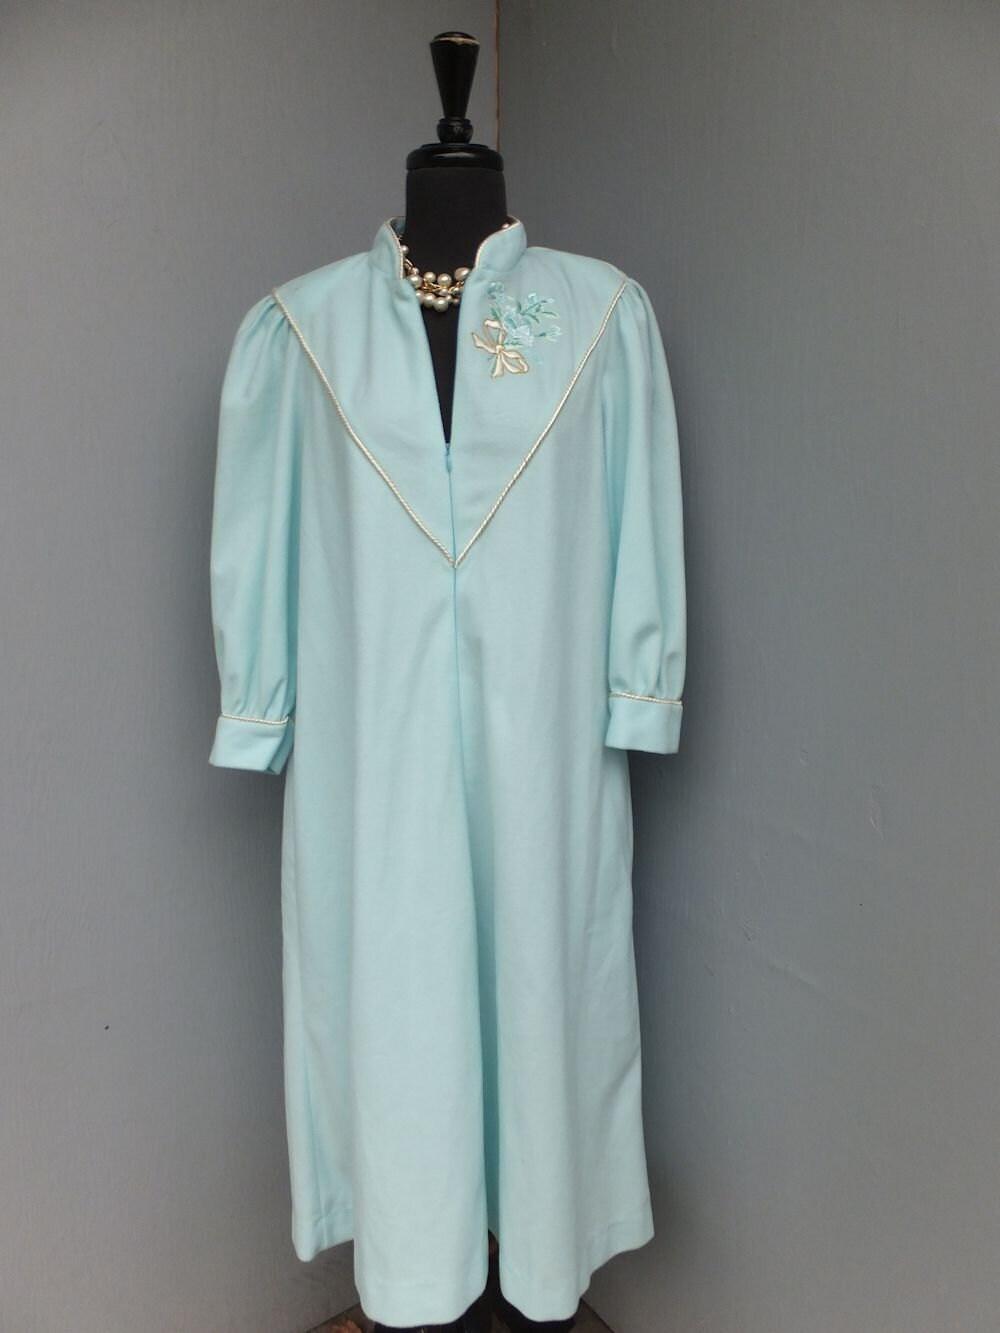 vintage robe flannel christian dior robe designer robe With robe christian dior